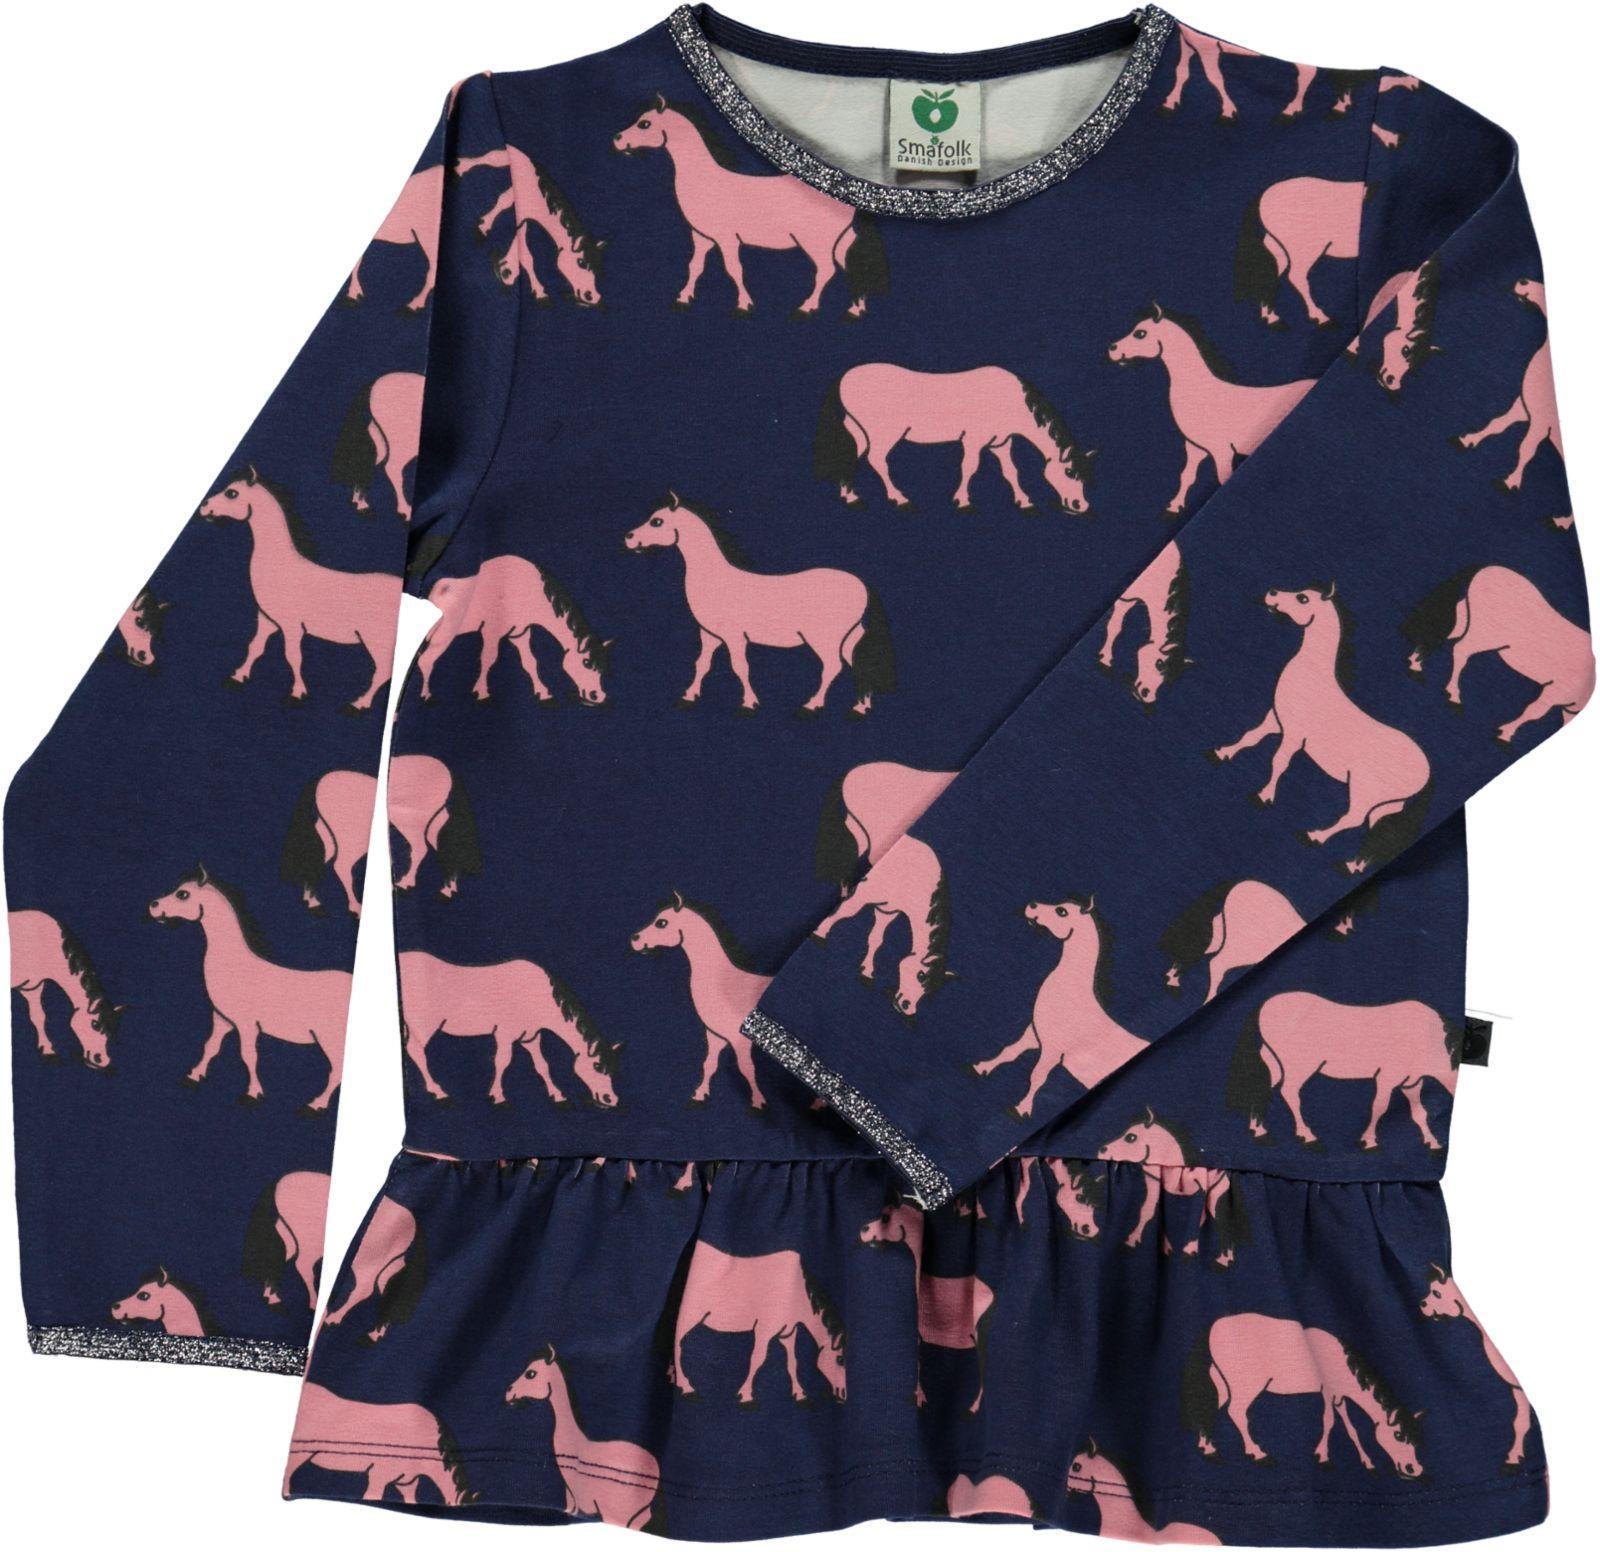 Småfolk - T-shirt w. Horse Print - Medieval Blue